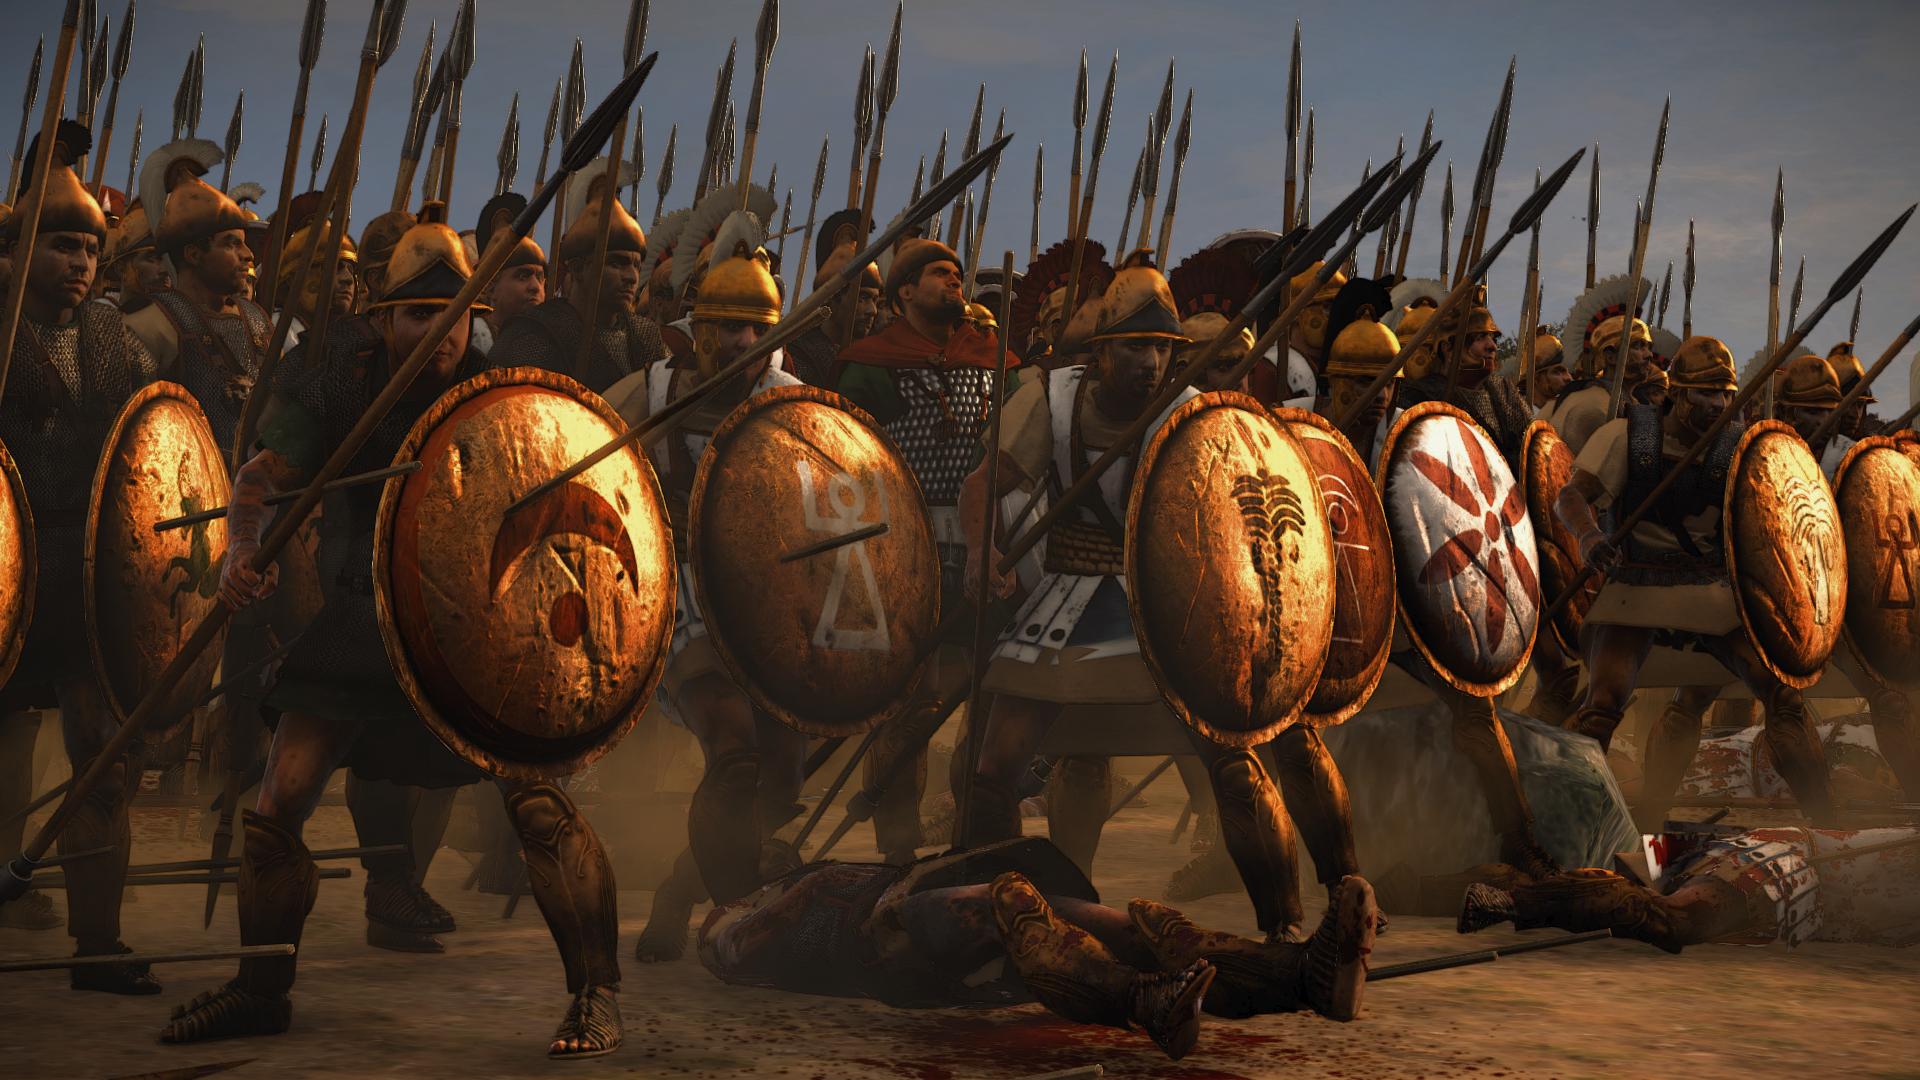 Rome Total War Wallpaper: [PREVIEW] Divide Et Impera : Trailer / Banner / Wallpaper